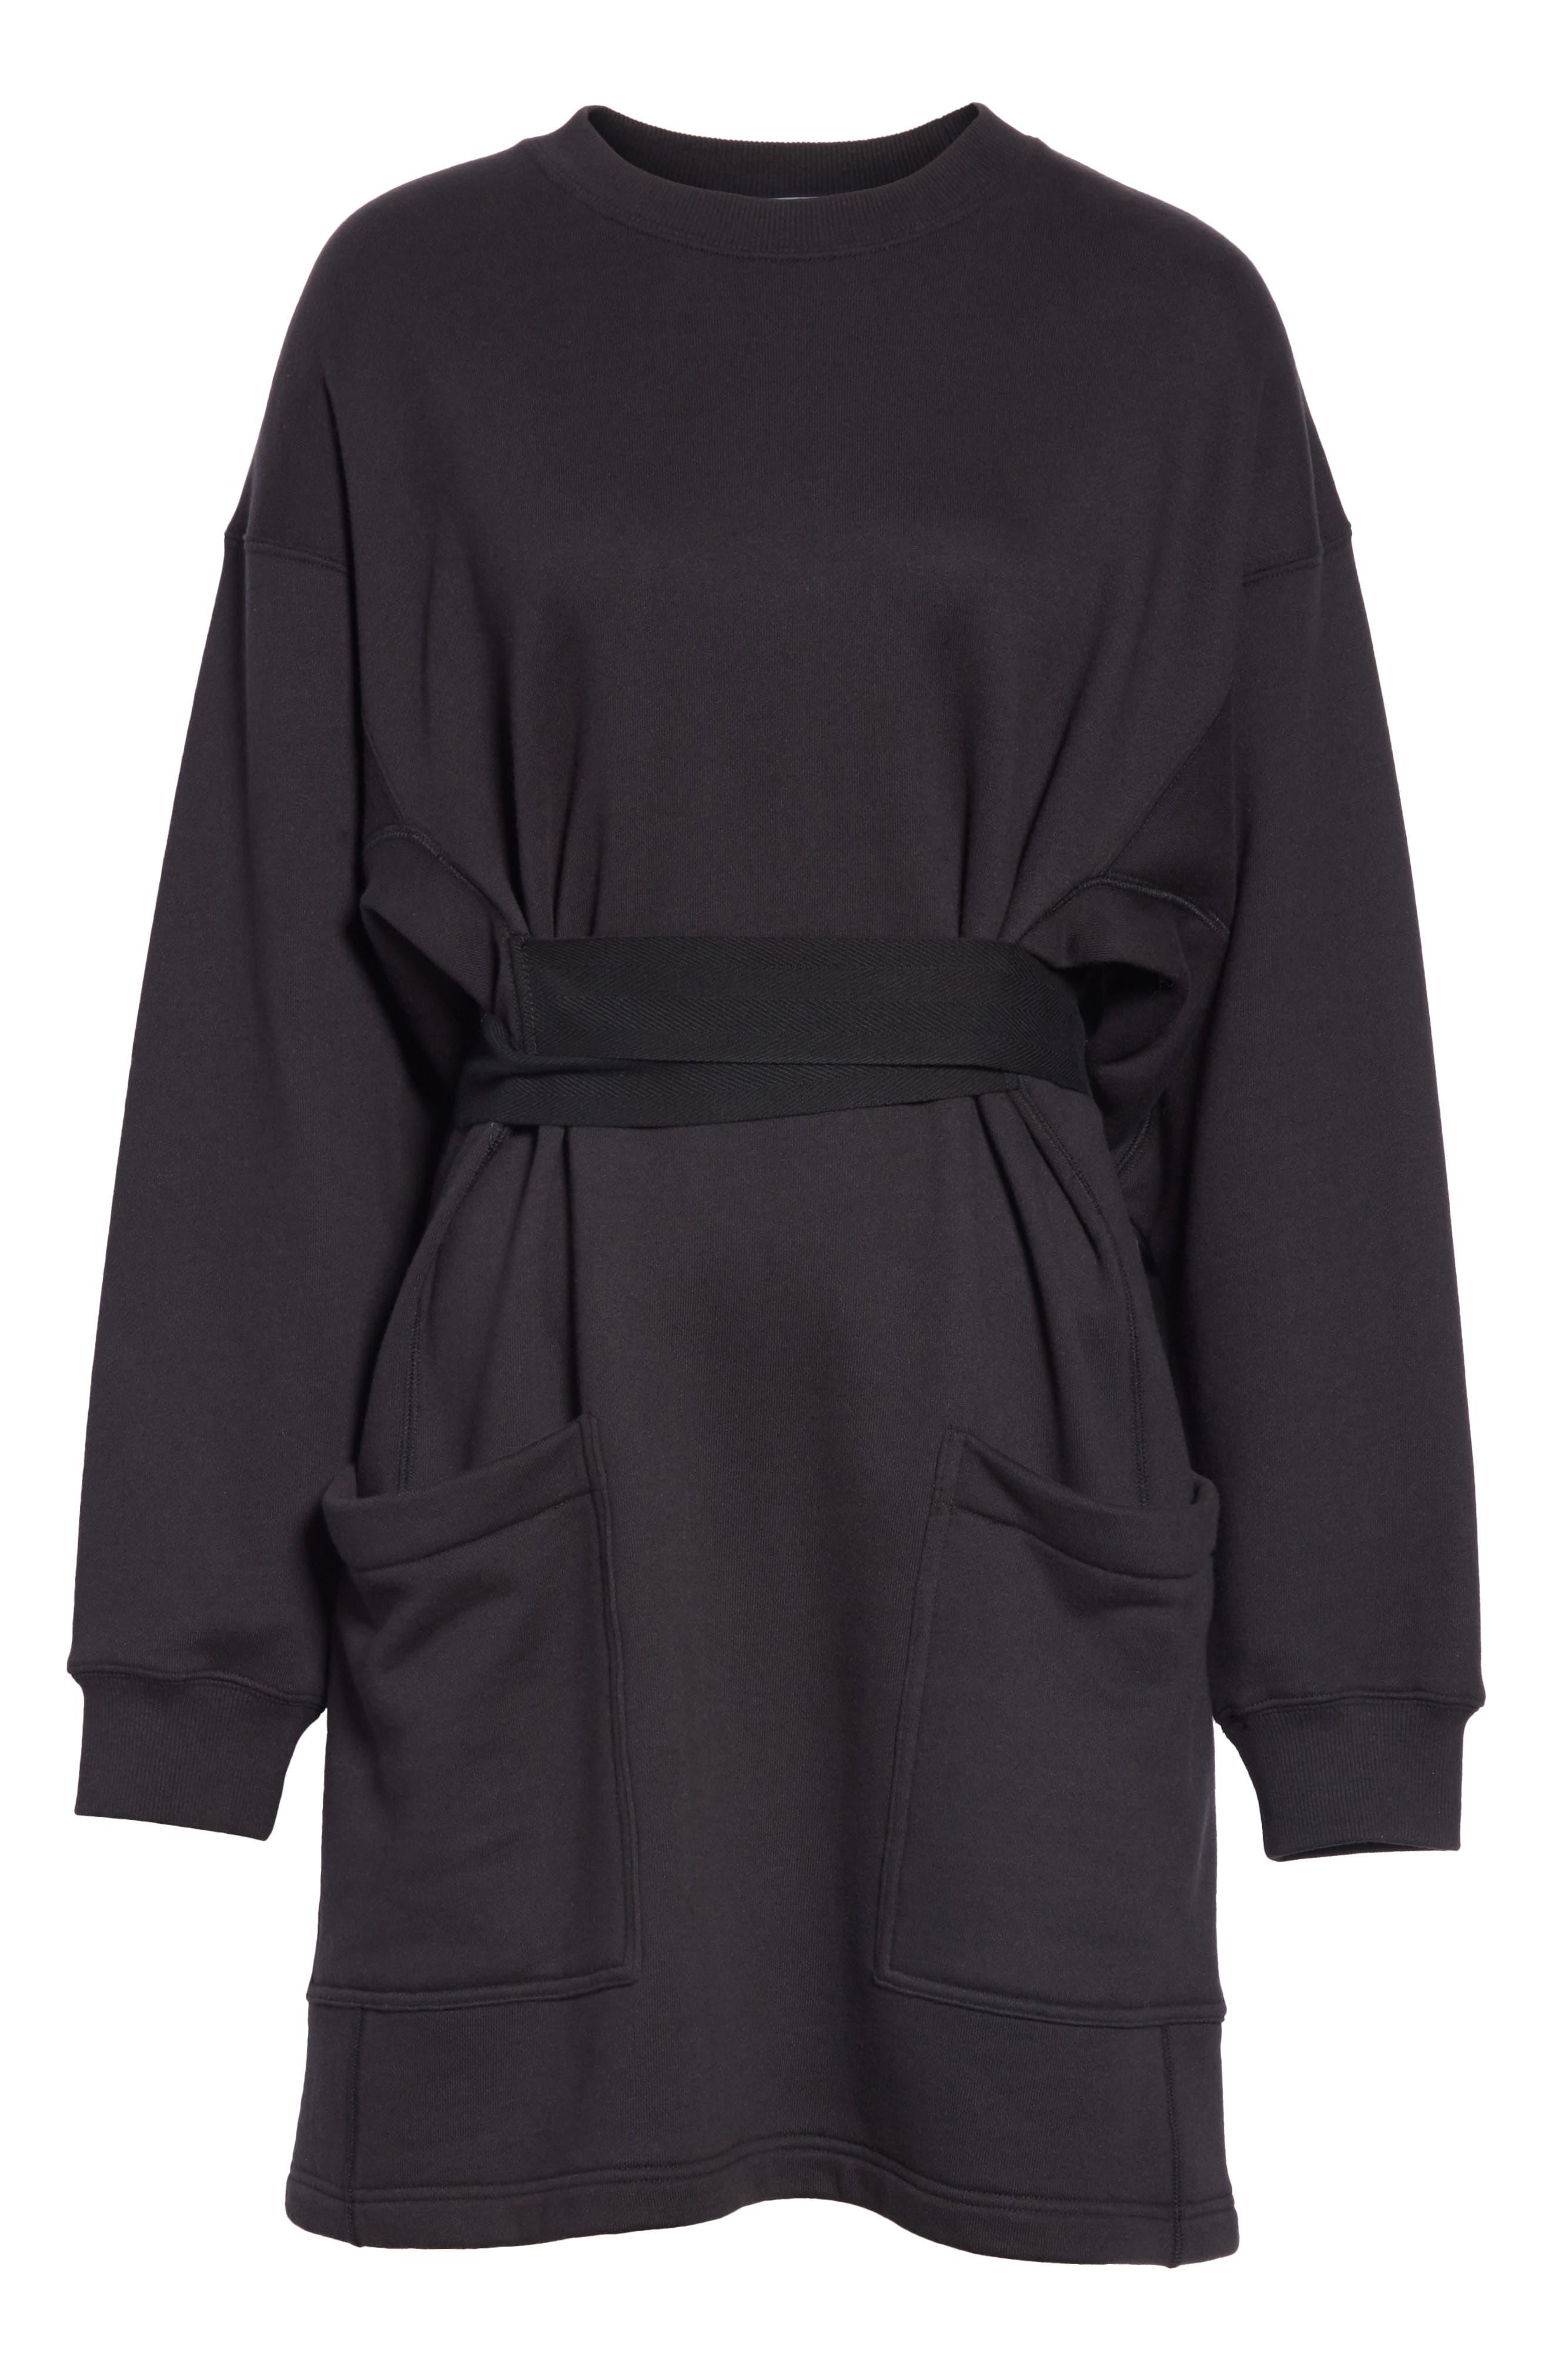 PSWL Belted Sweatshirt Dress,                             Alternate thumbnail 7, color,                             BLACK